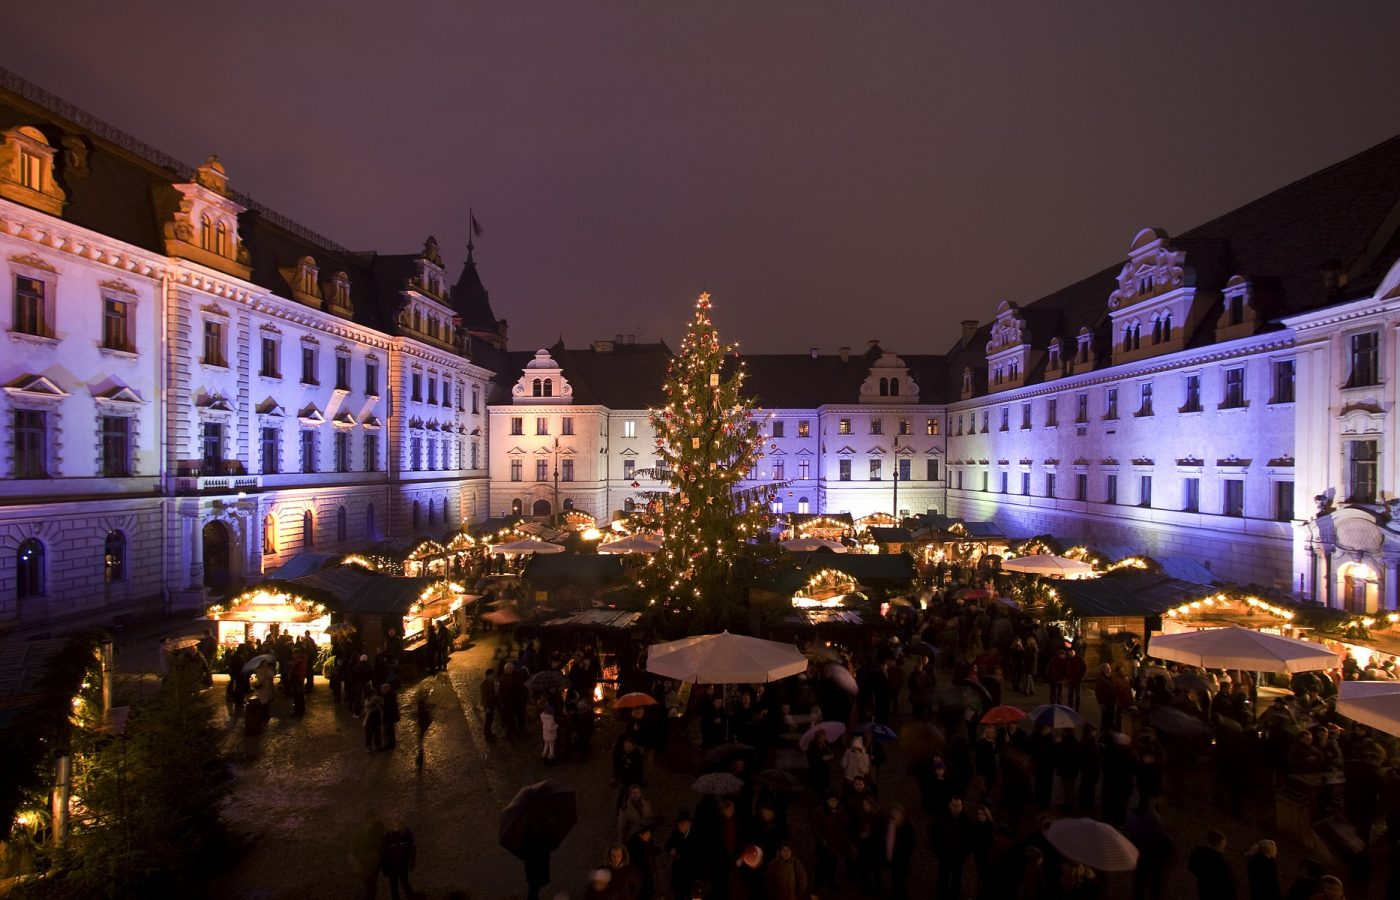 hotel_bad_abbach_ausflugsziel_regensburg_christkindlmarkt_schloss_thurn_und_taxis